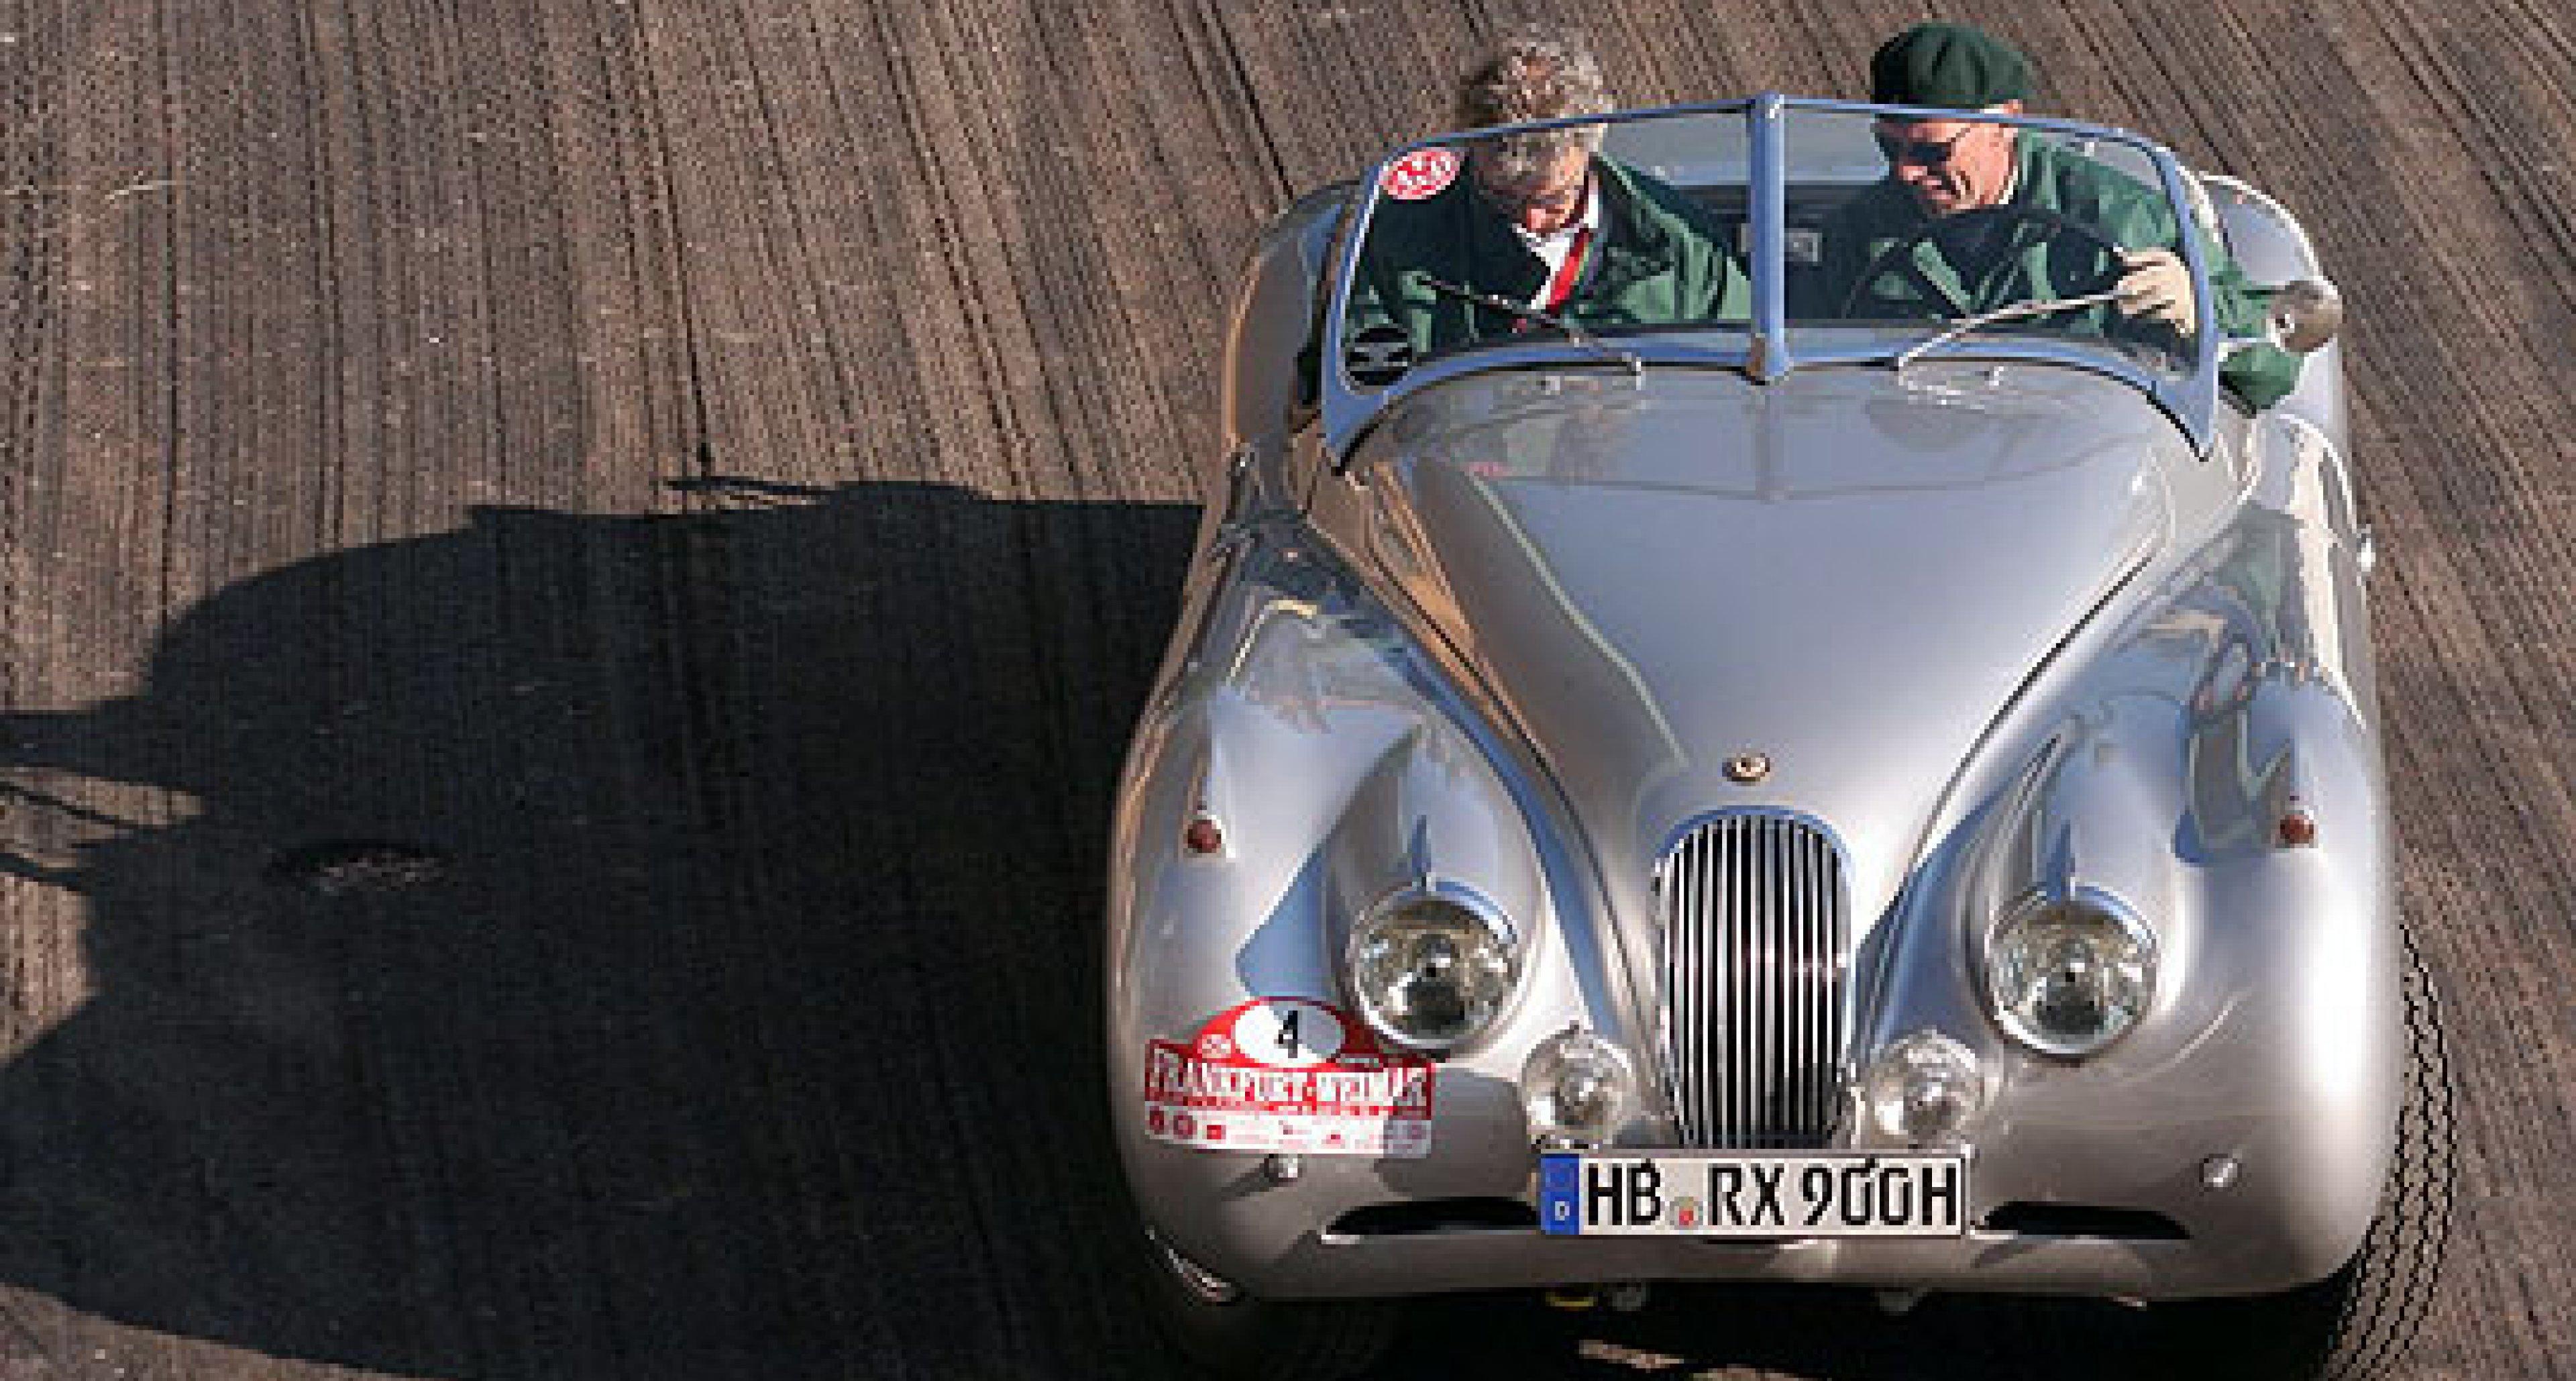 Frankfurt-Weimar Car Classic